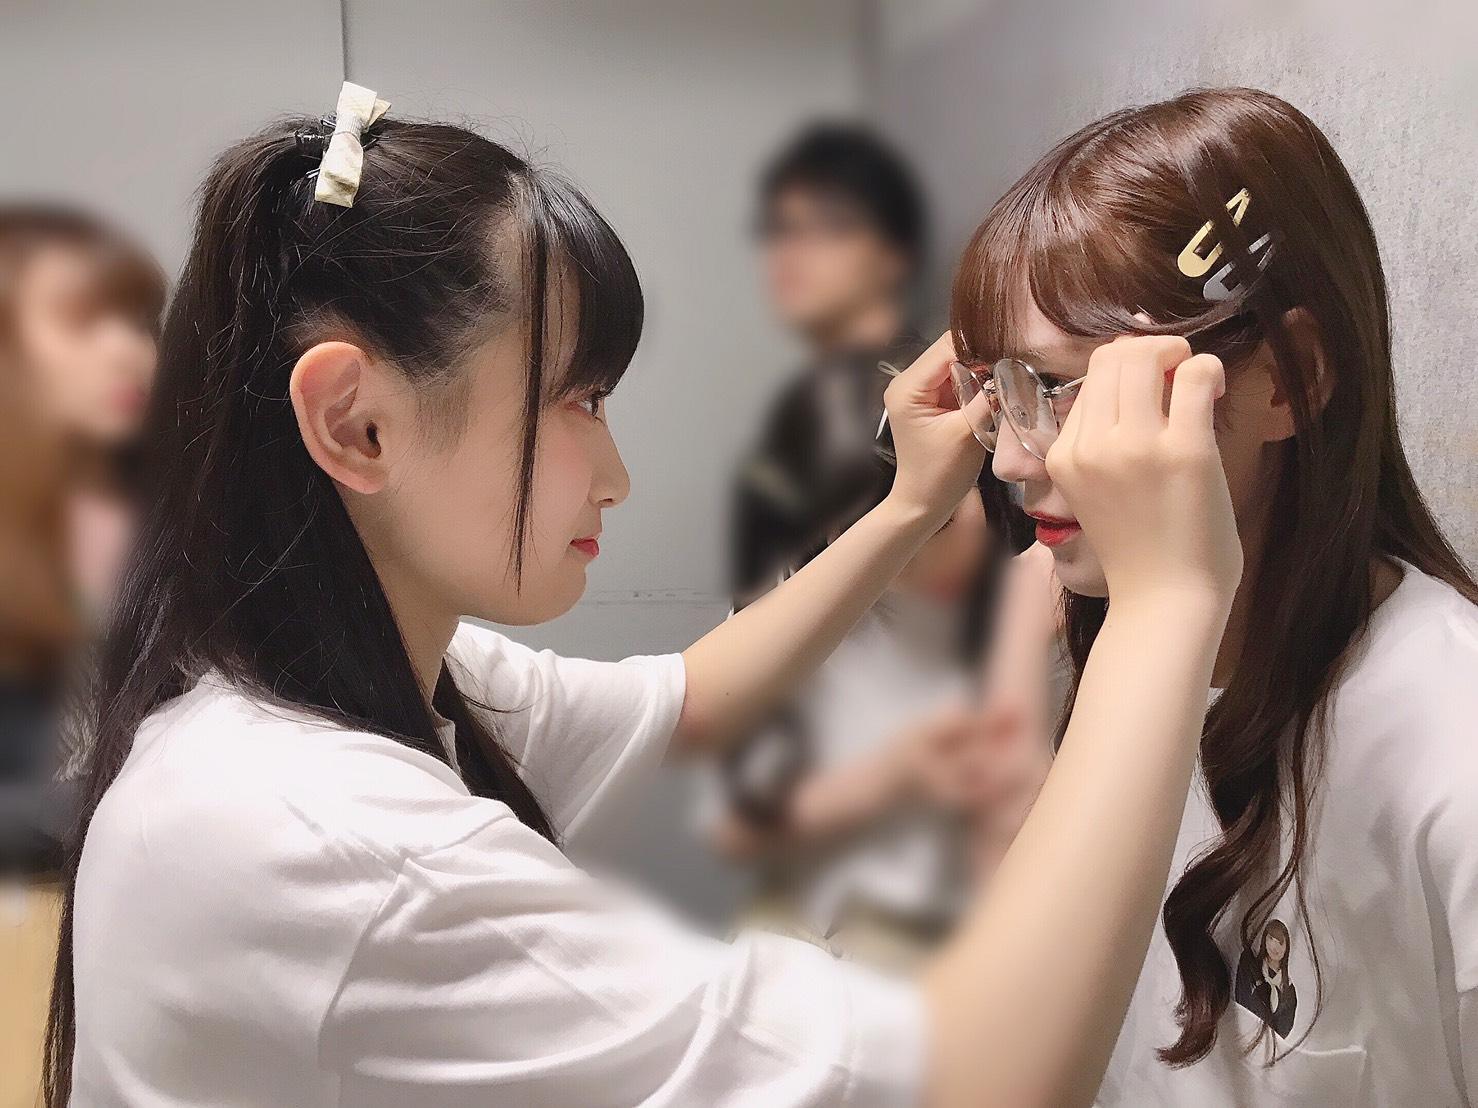 Umur yang ingin memakaikan kacamata (14). Umur yang ingin dipakaikan kacamata (22).